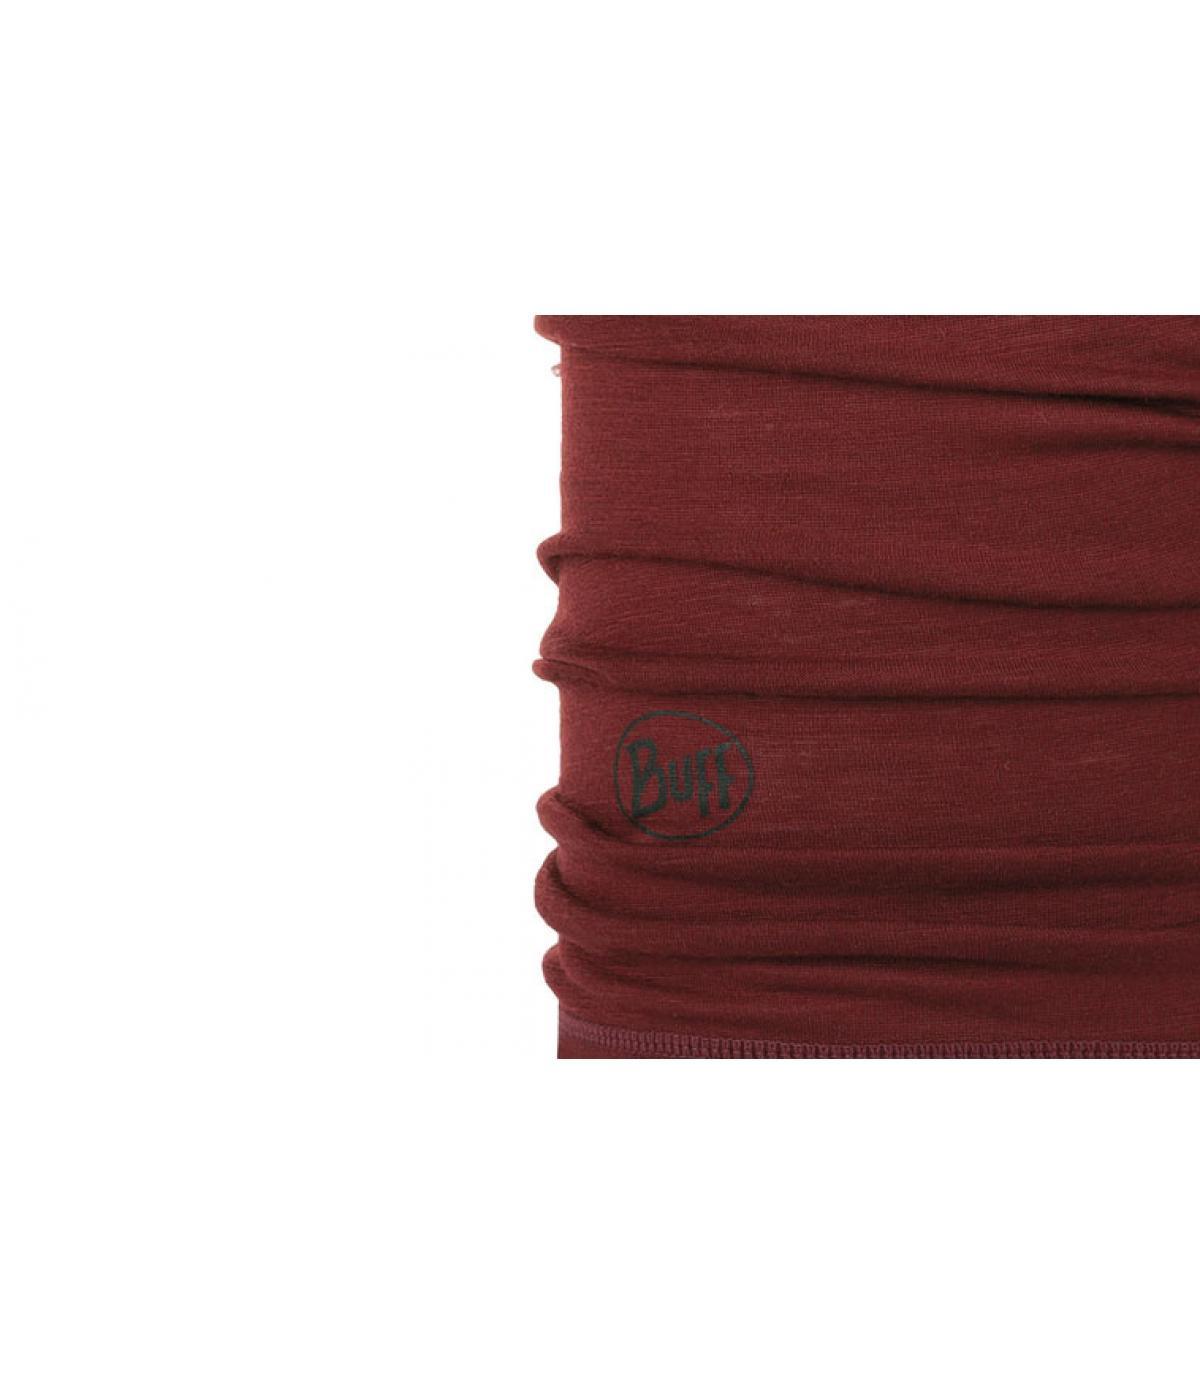 Details Lightweight Merino Wool solid wine - afbeeling 2